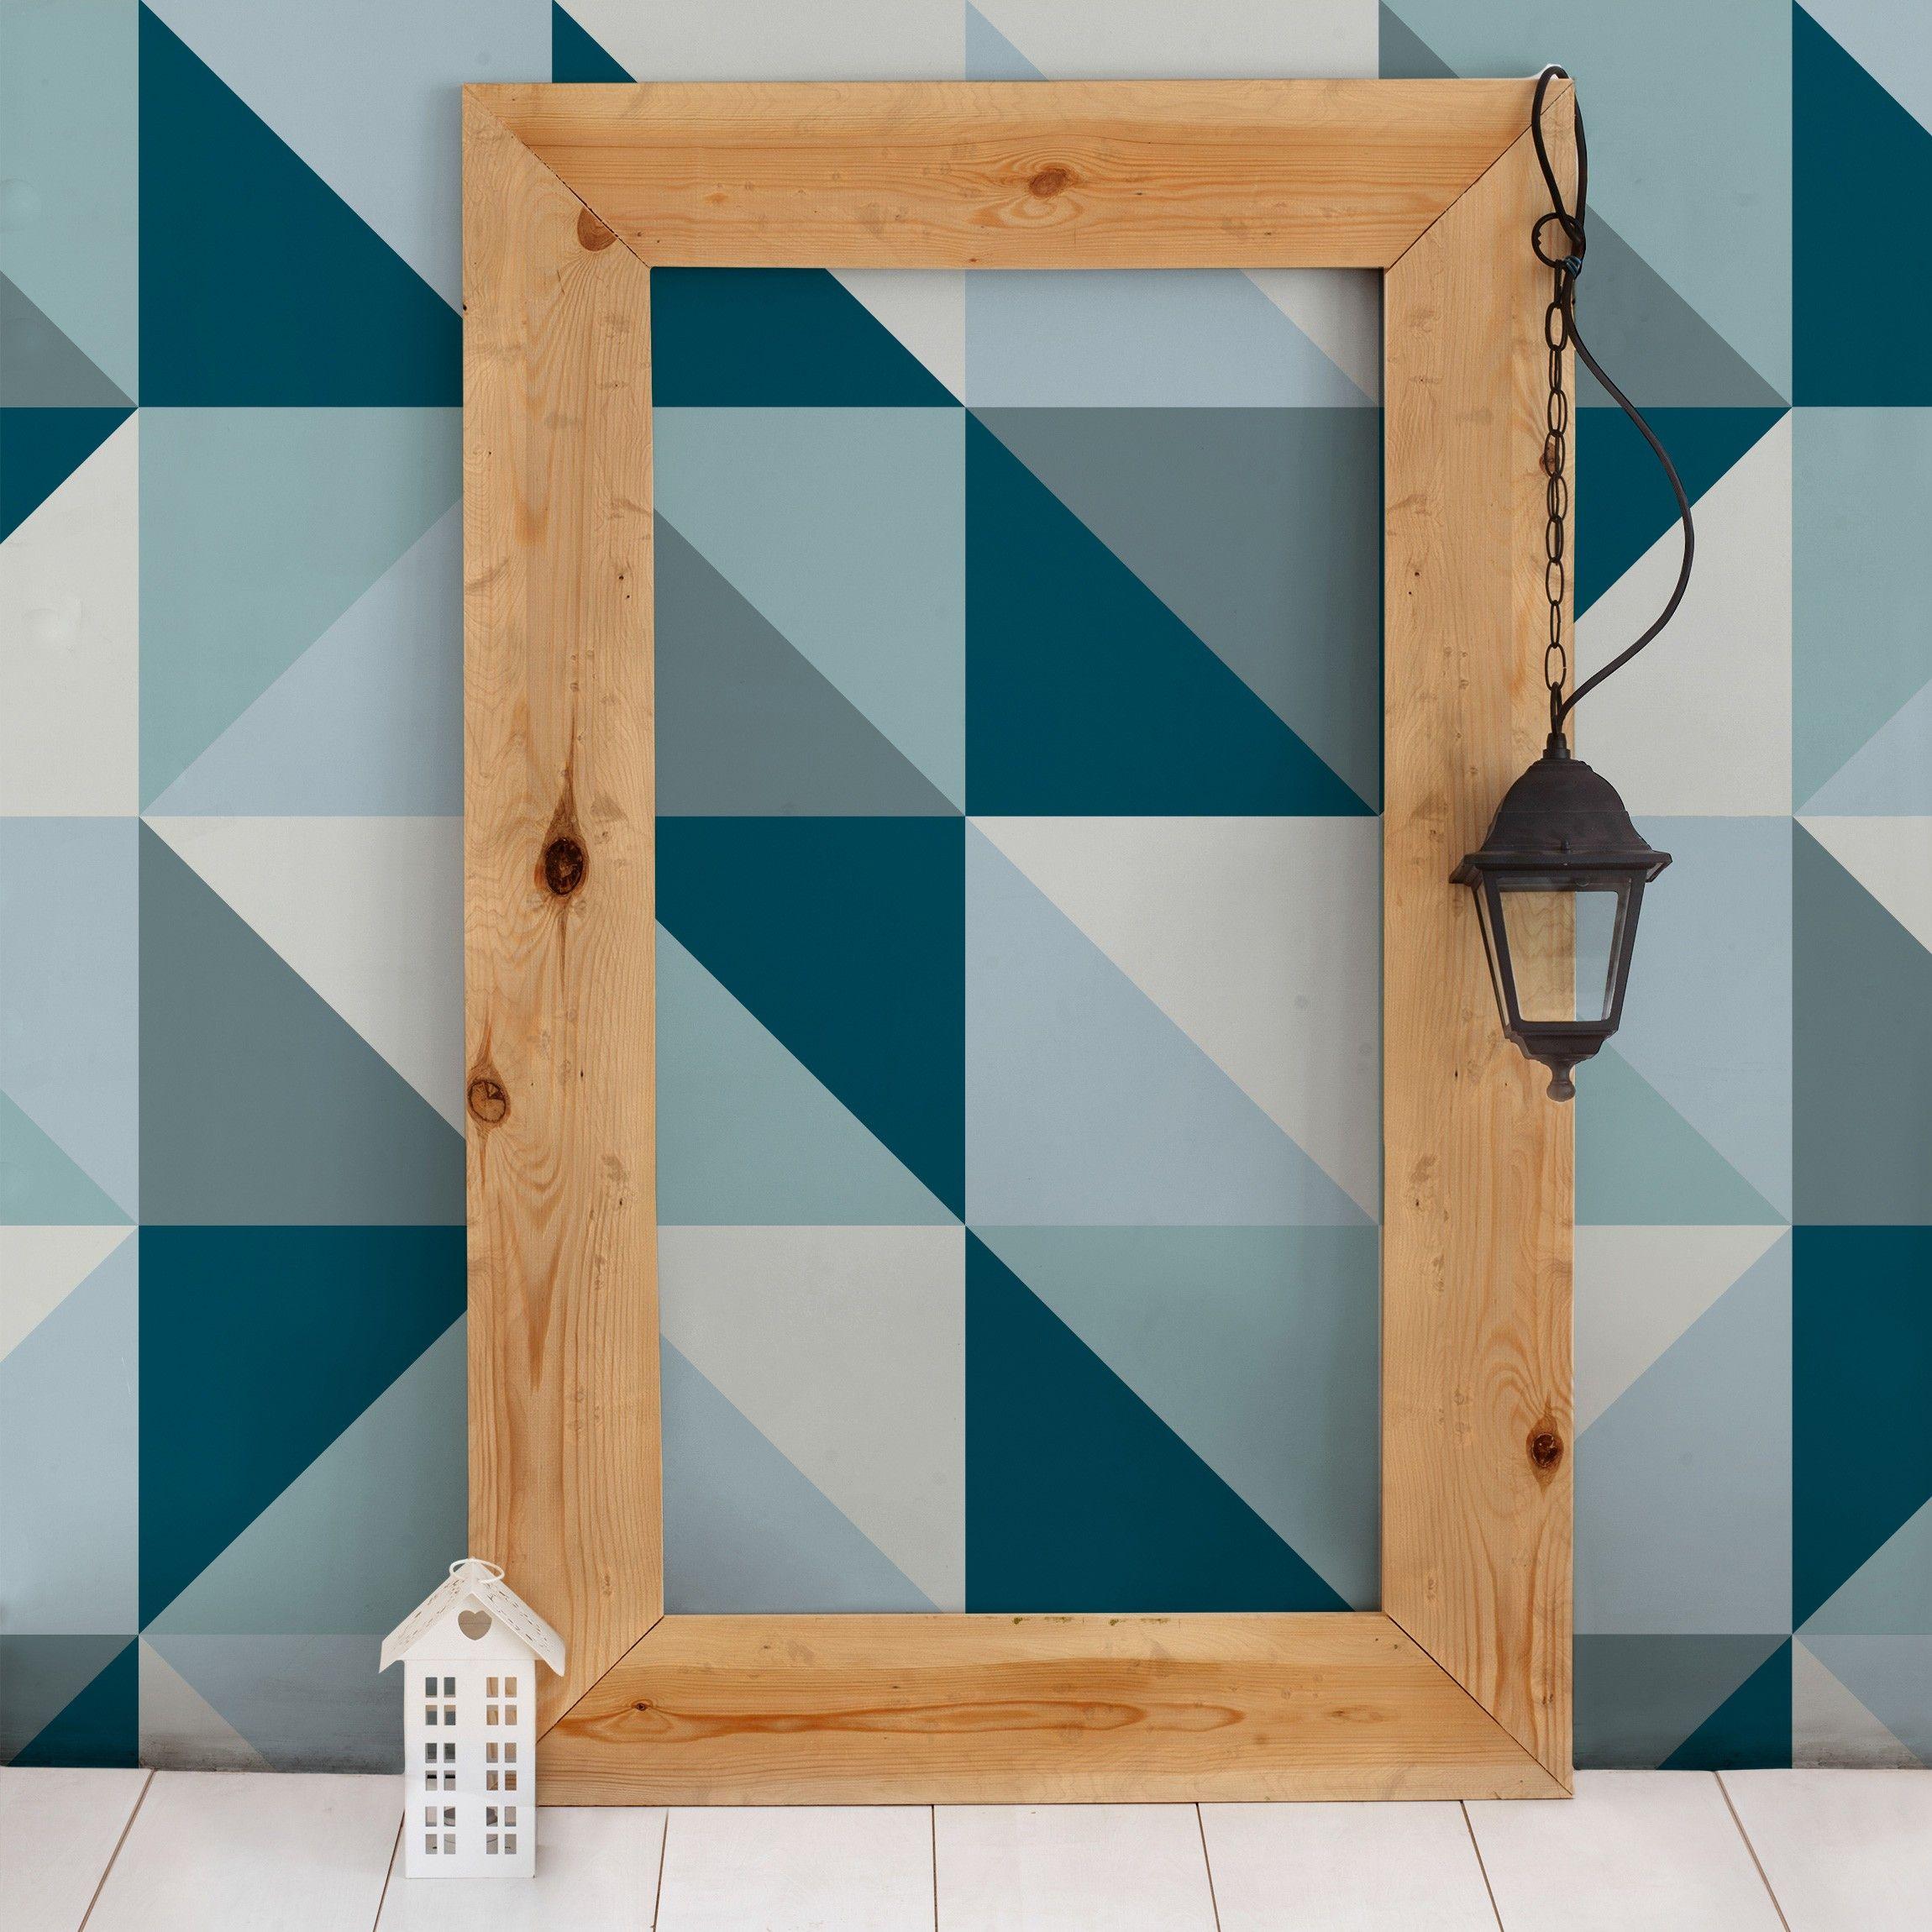 Design Tapete  Blaues Dreieck Muster  Vlies Fototapete Breit